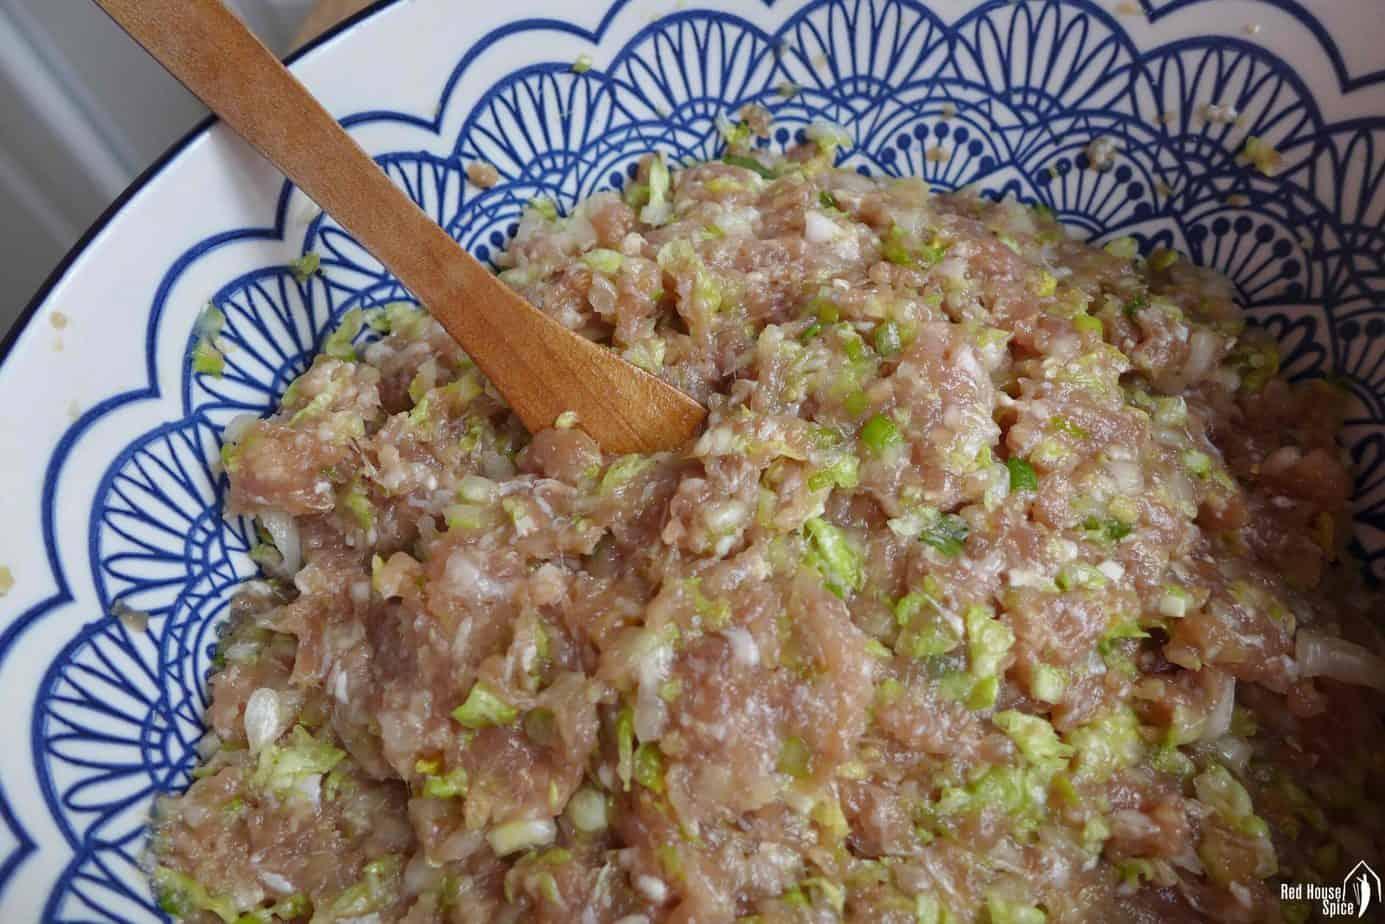 pork and napa cabbage dumpling filling